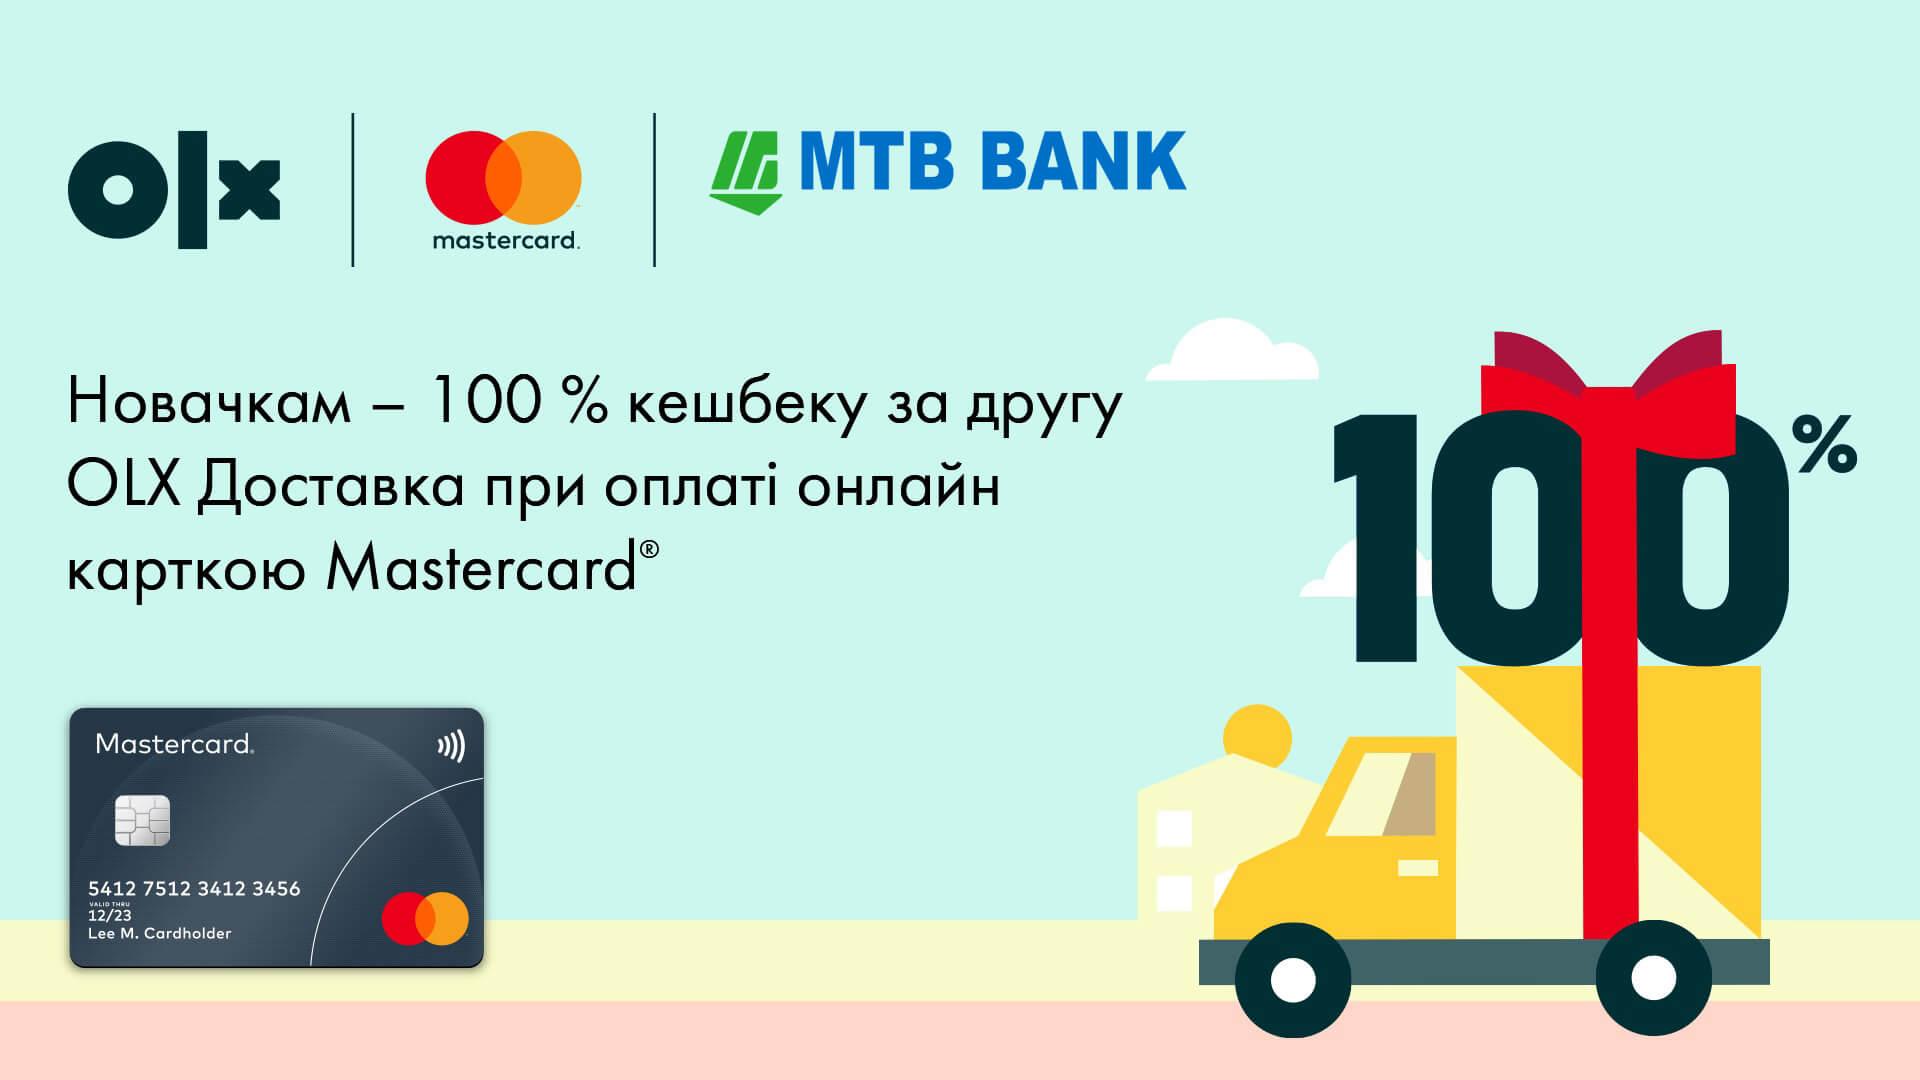 OLX - 100 % кешбеку новачкам за другу OLX Доставка з вашою Mastercard® - фото - mtb.ua